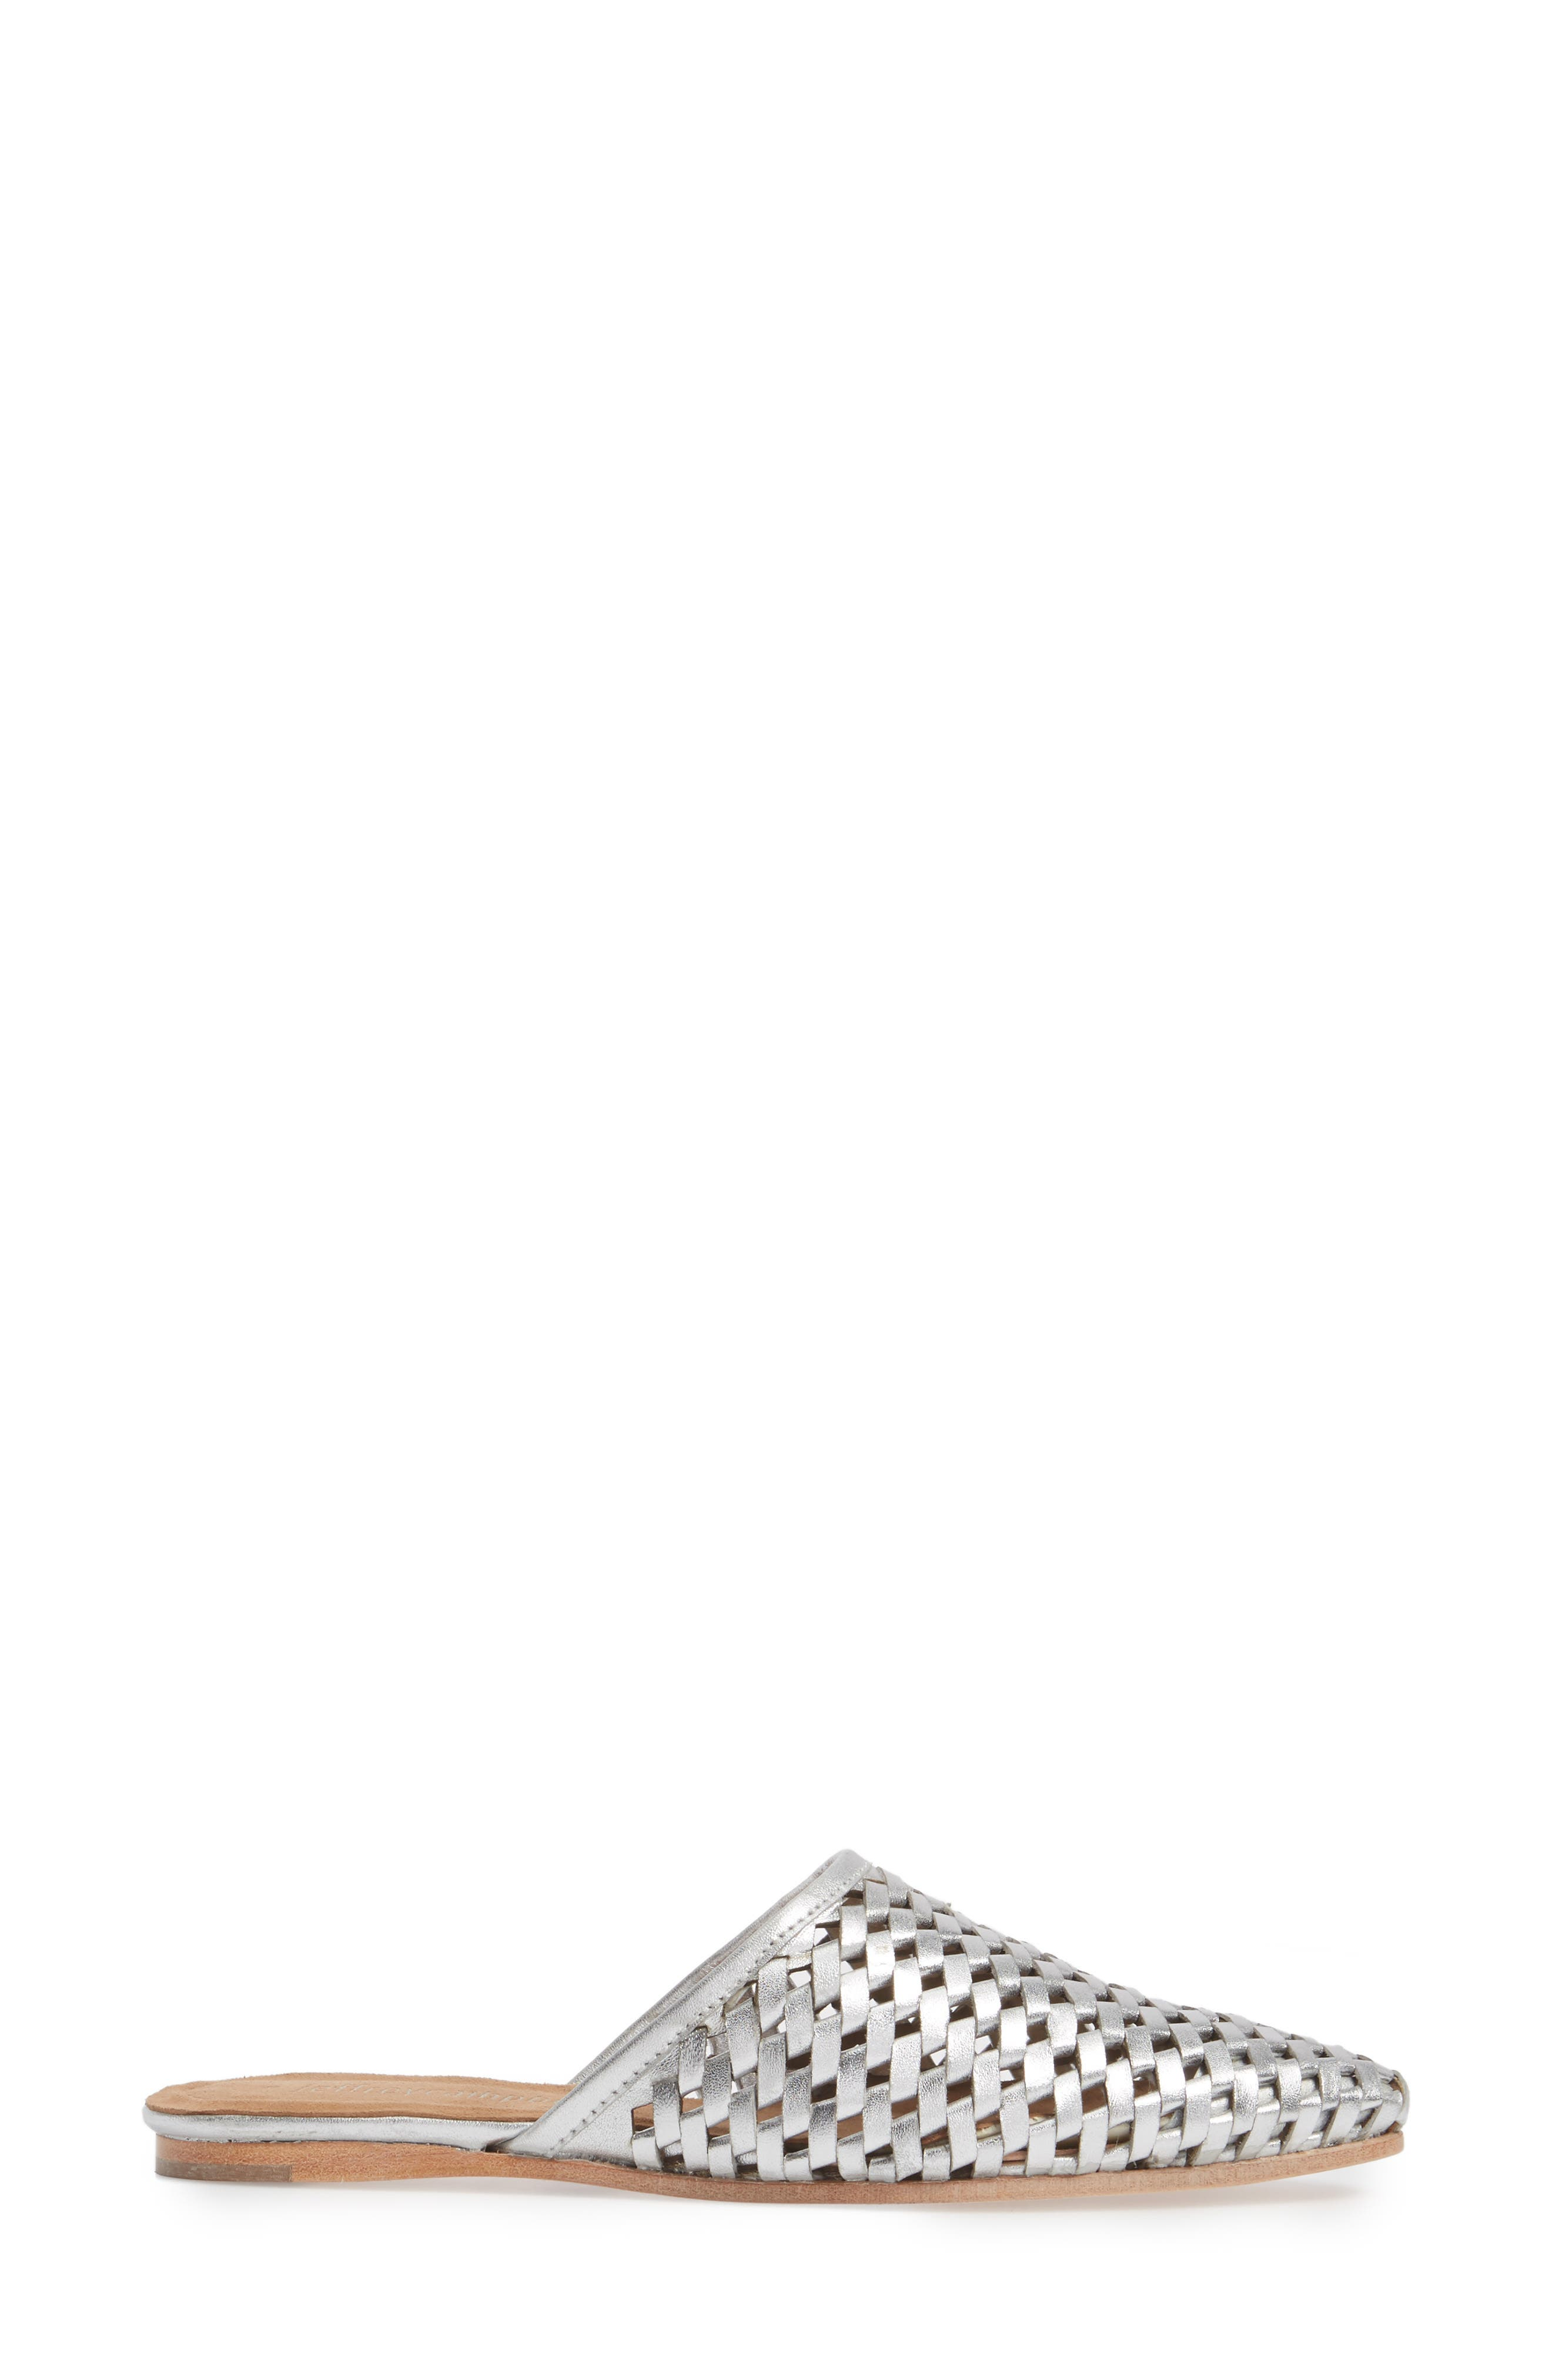 Doshi Woven Mule,                             Alternate thumbnail 3, color,                             040